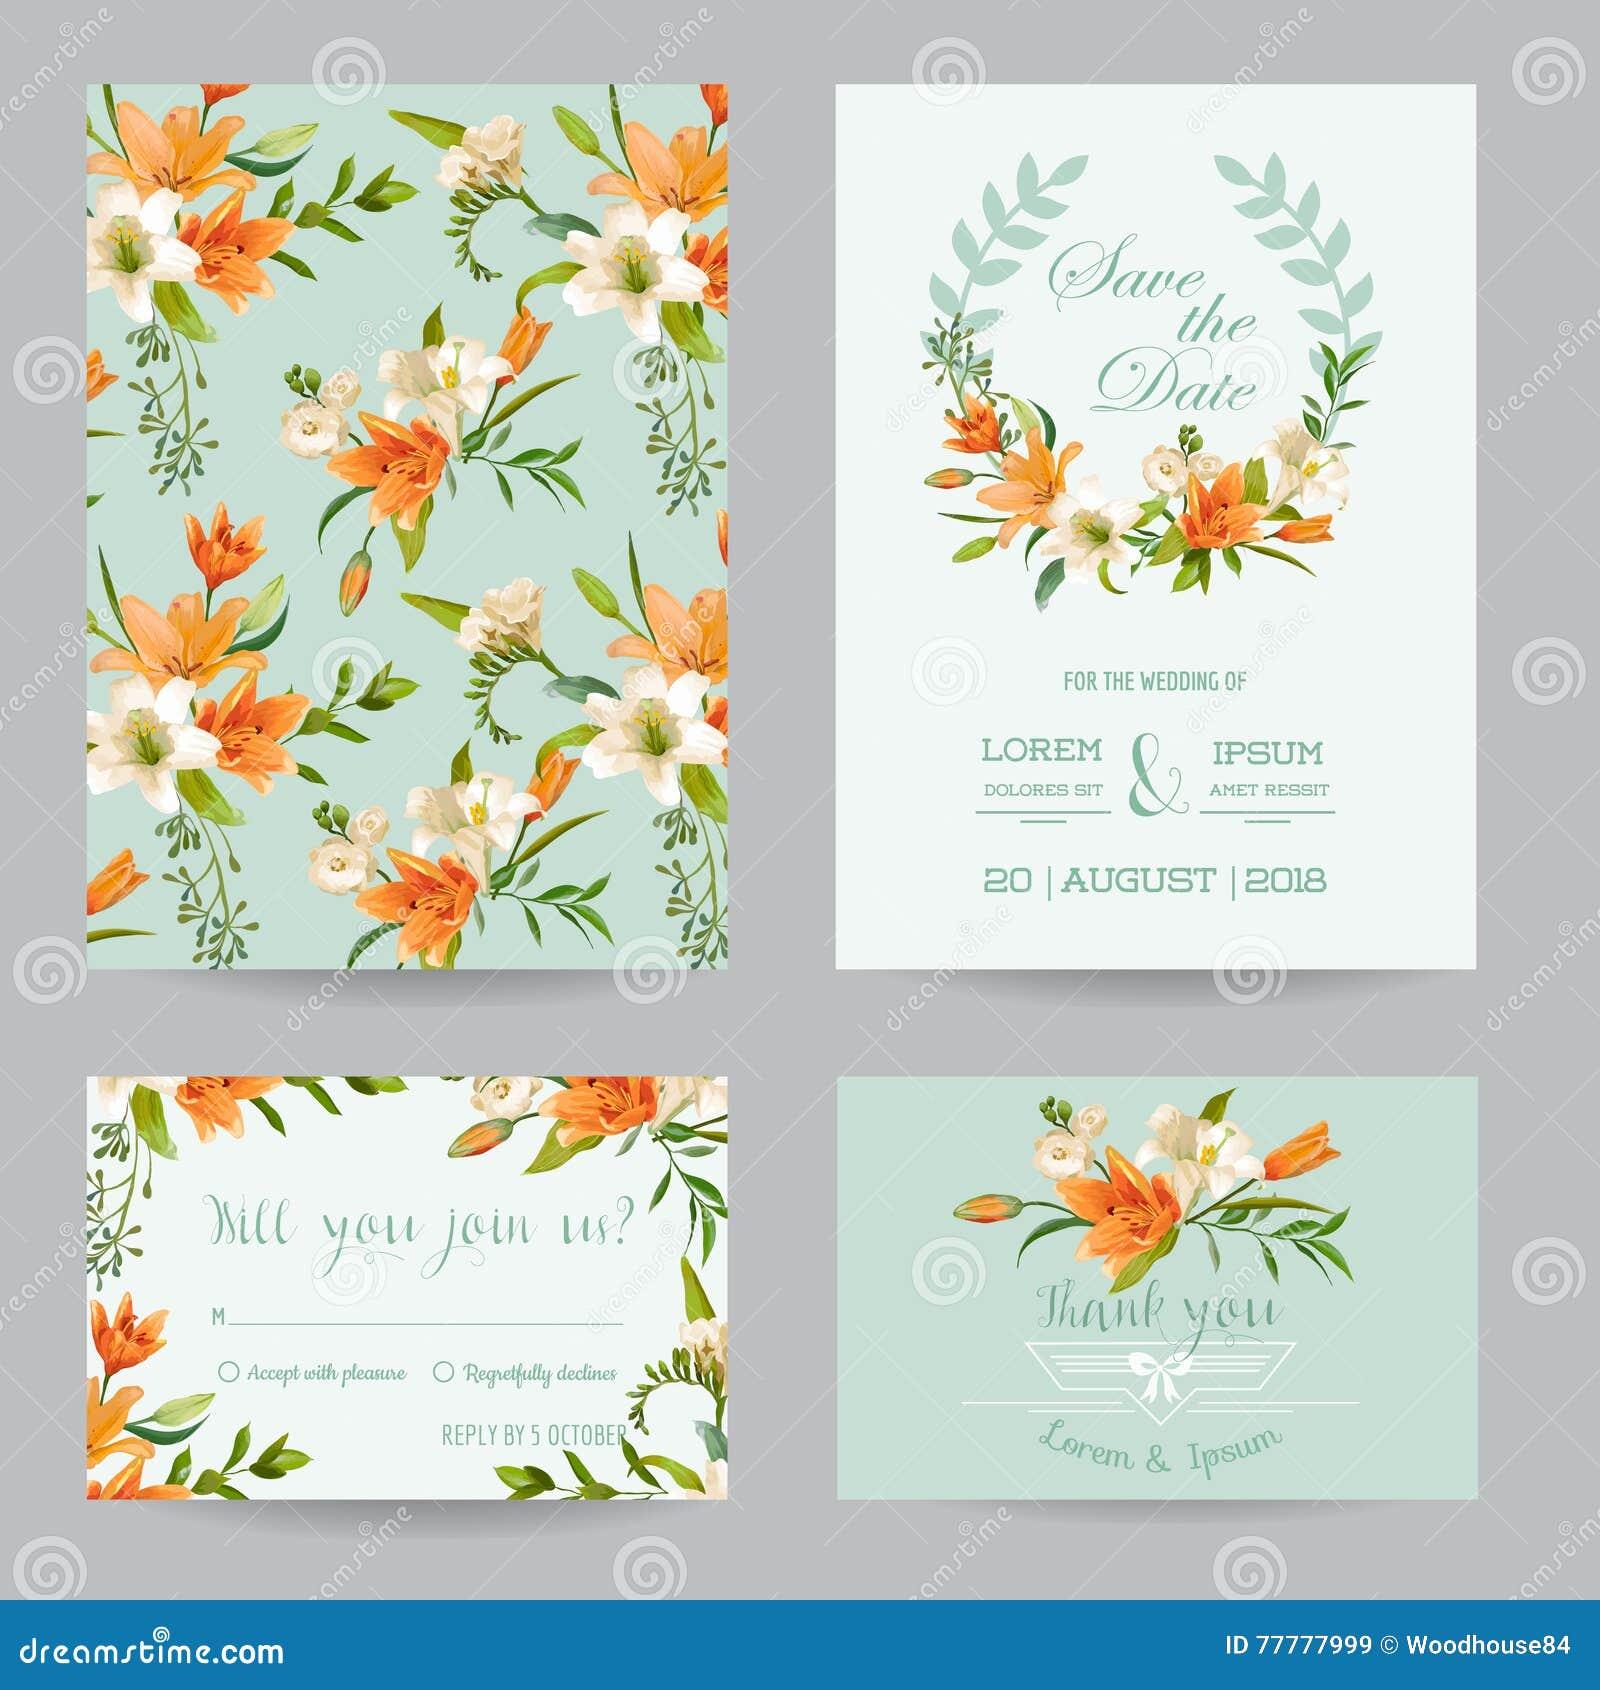 Wedding Invitation Set - Autumn Lily Floral